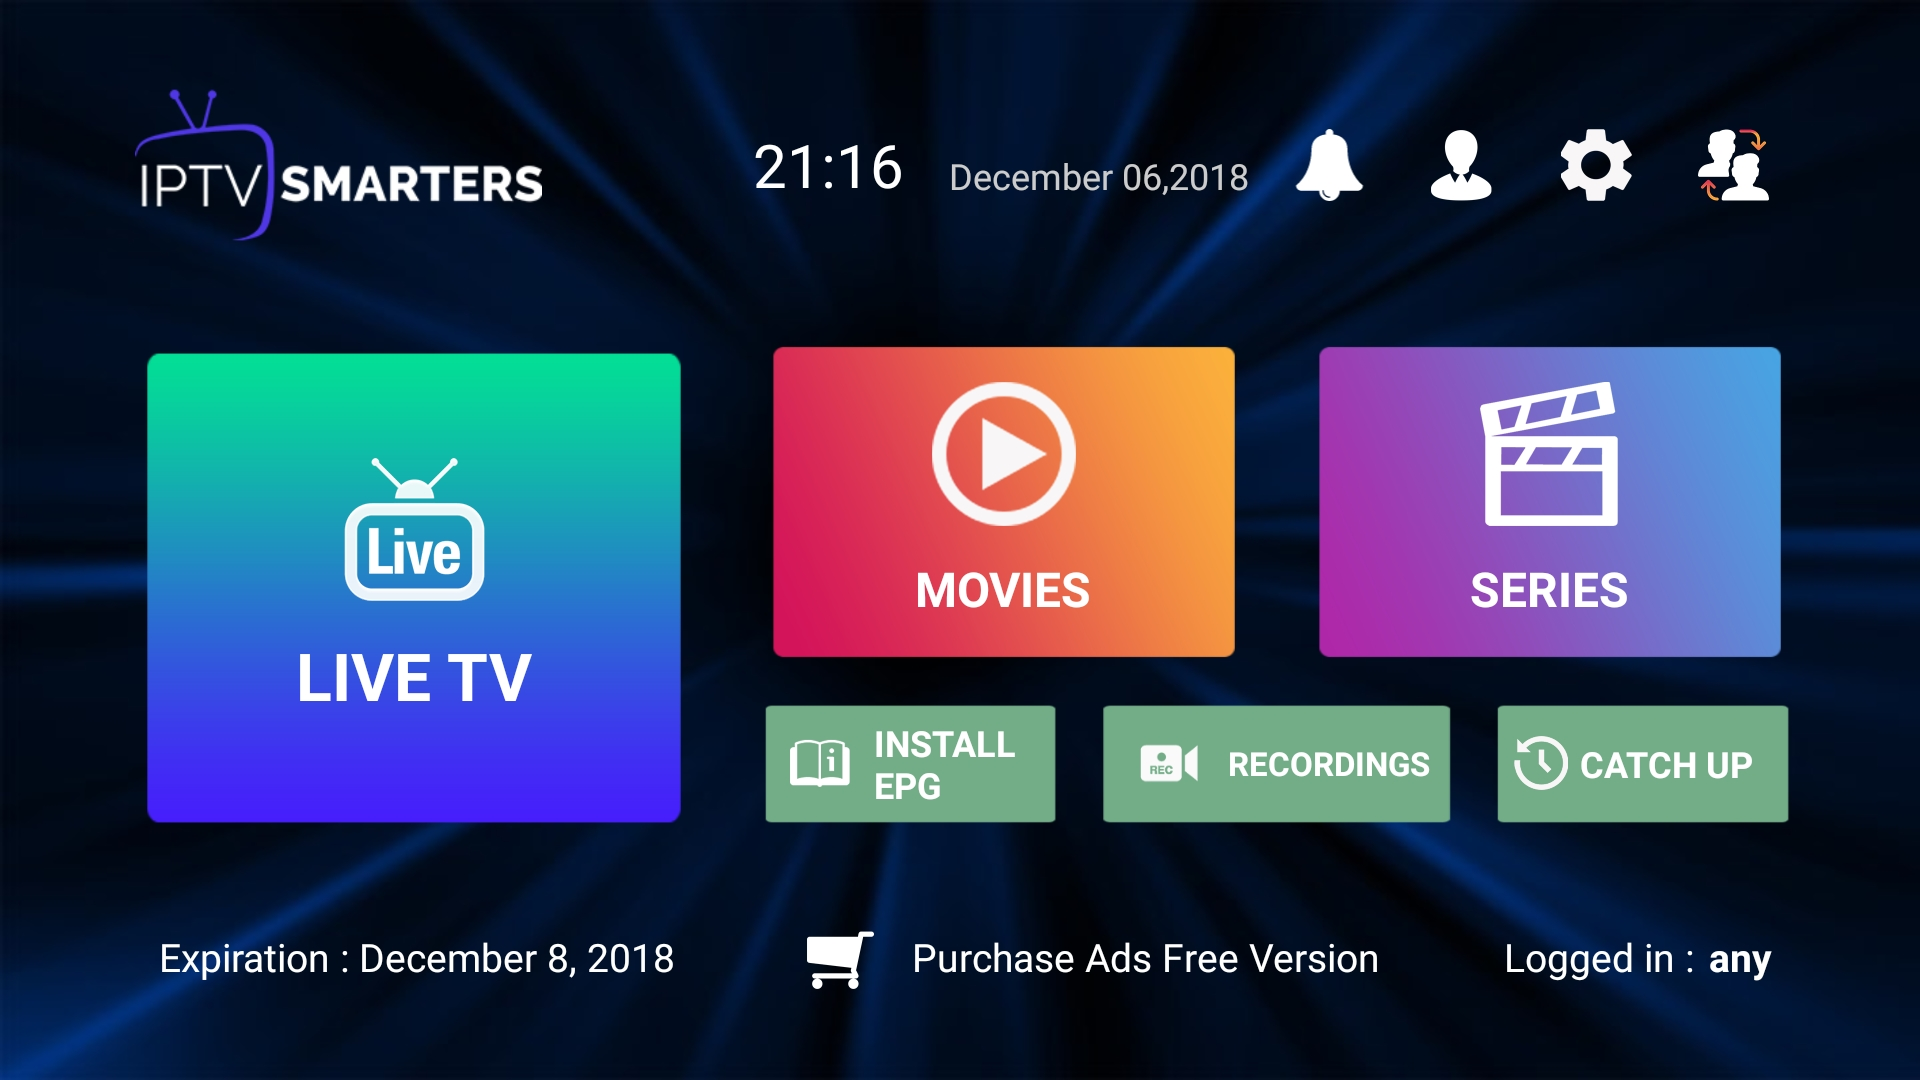 We Do Streaming! - How to setup IPTV on IPTV Smarters App?